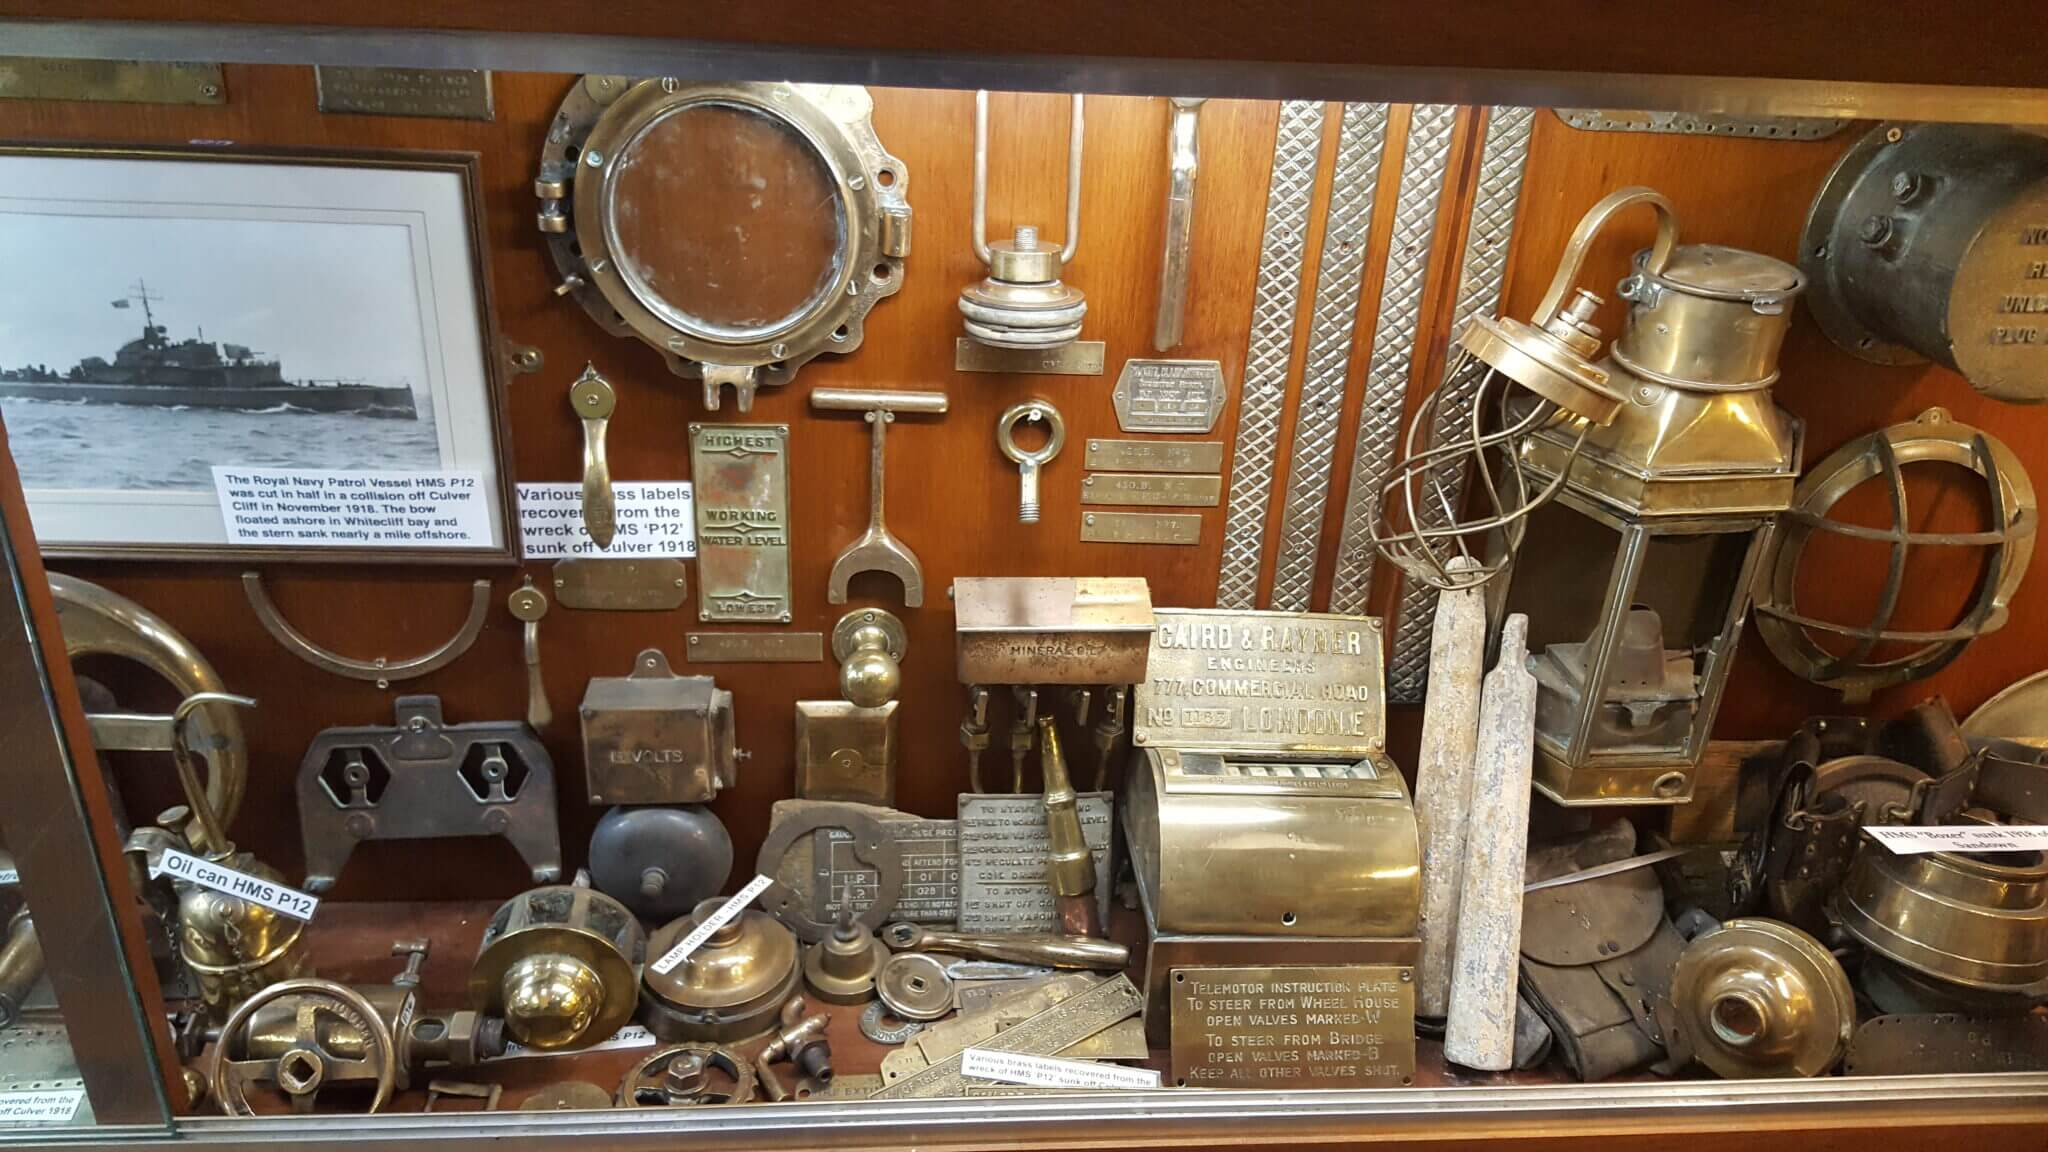 maritime museum ww1 shipwreck artefacts